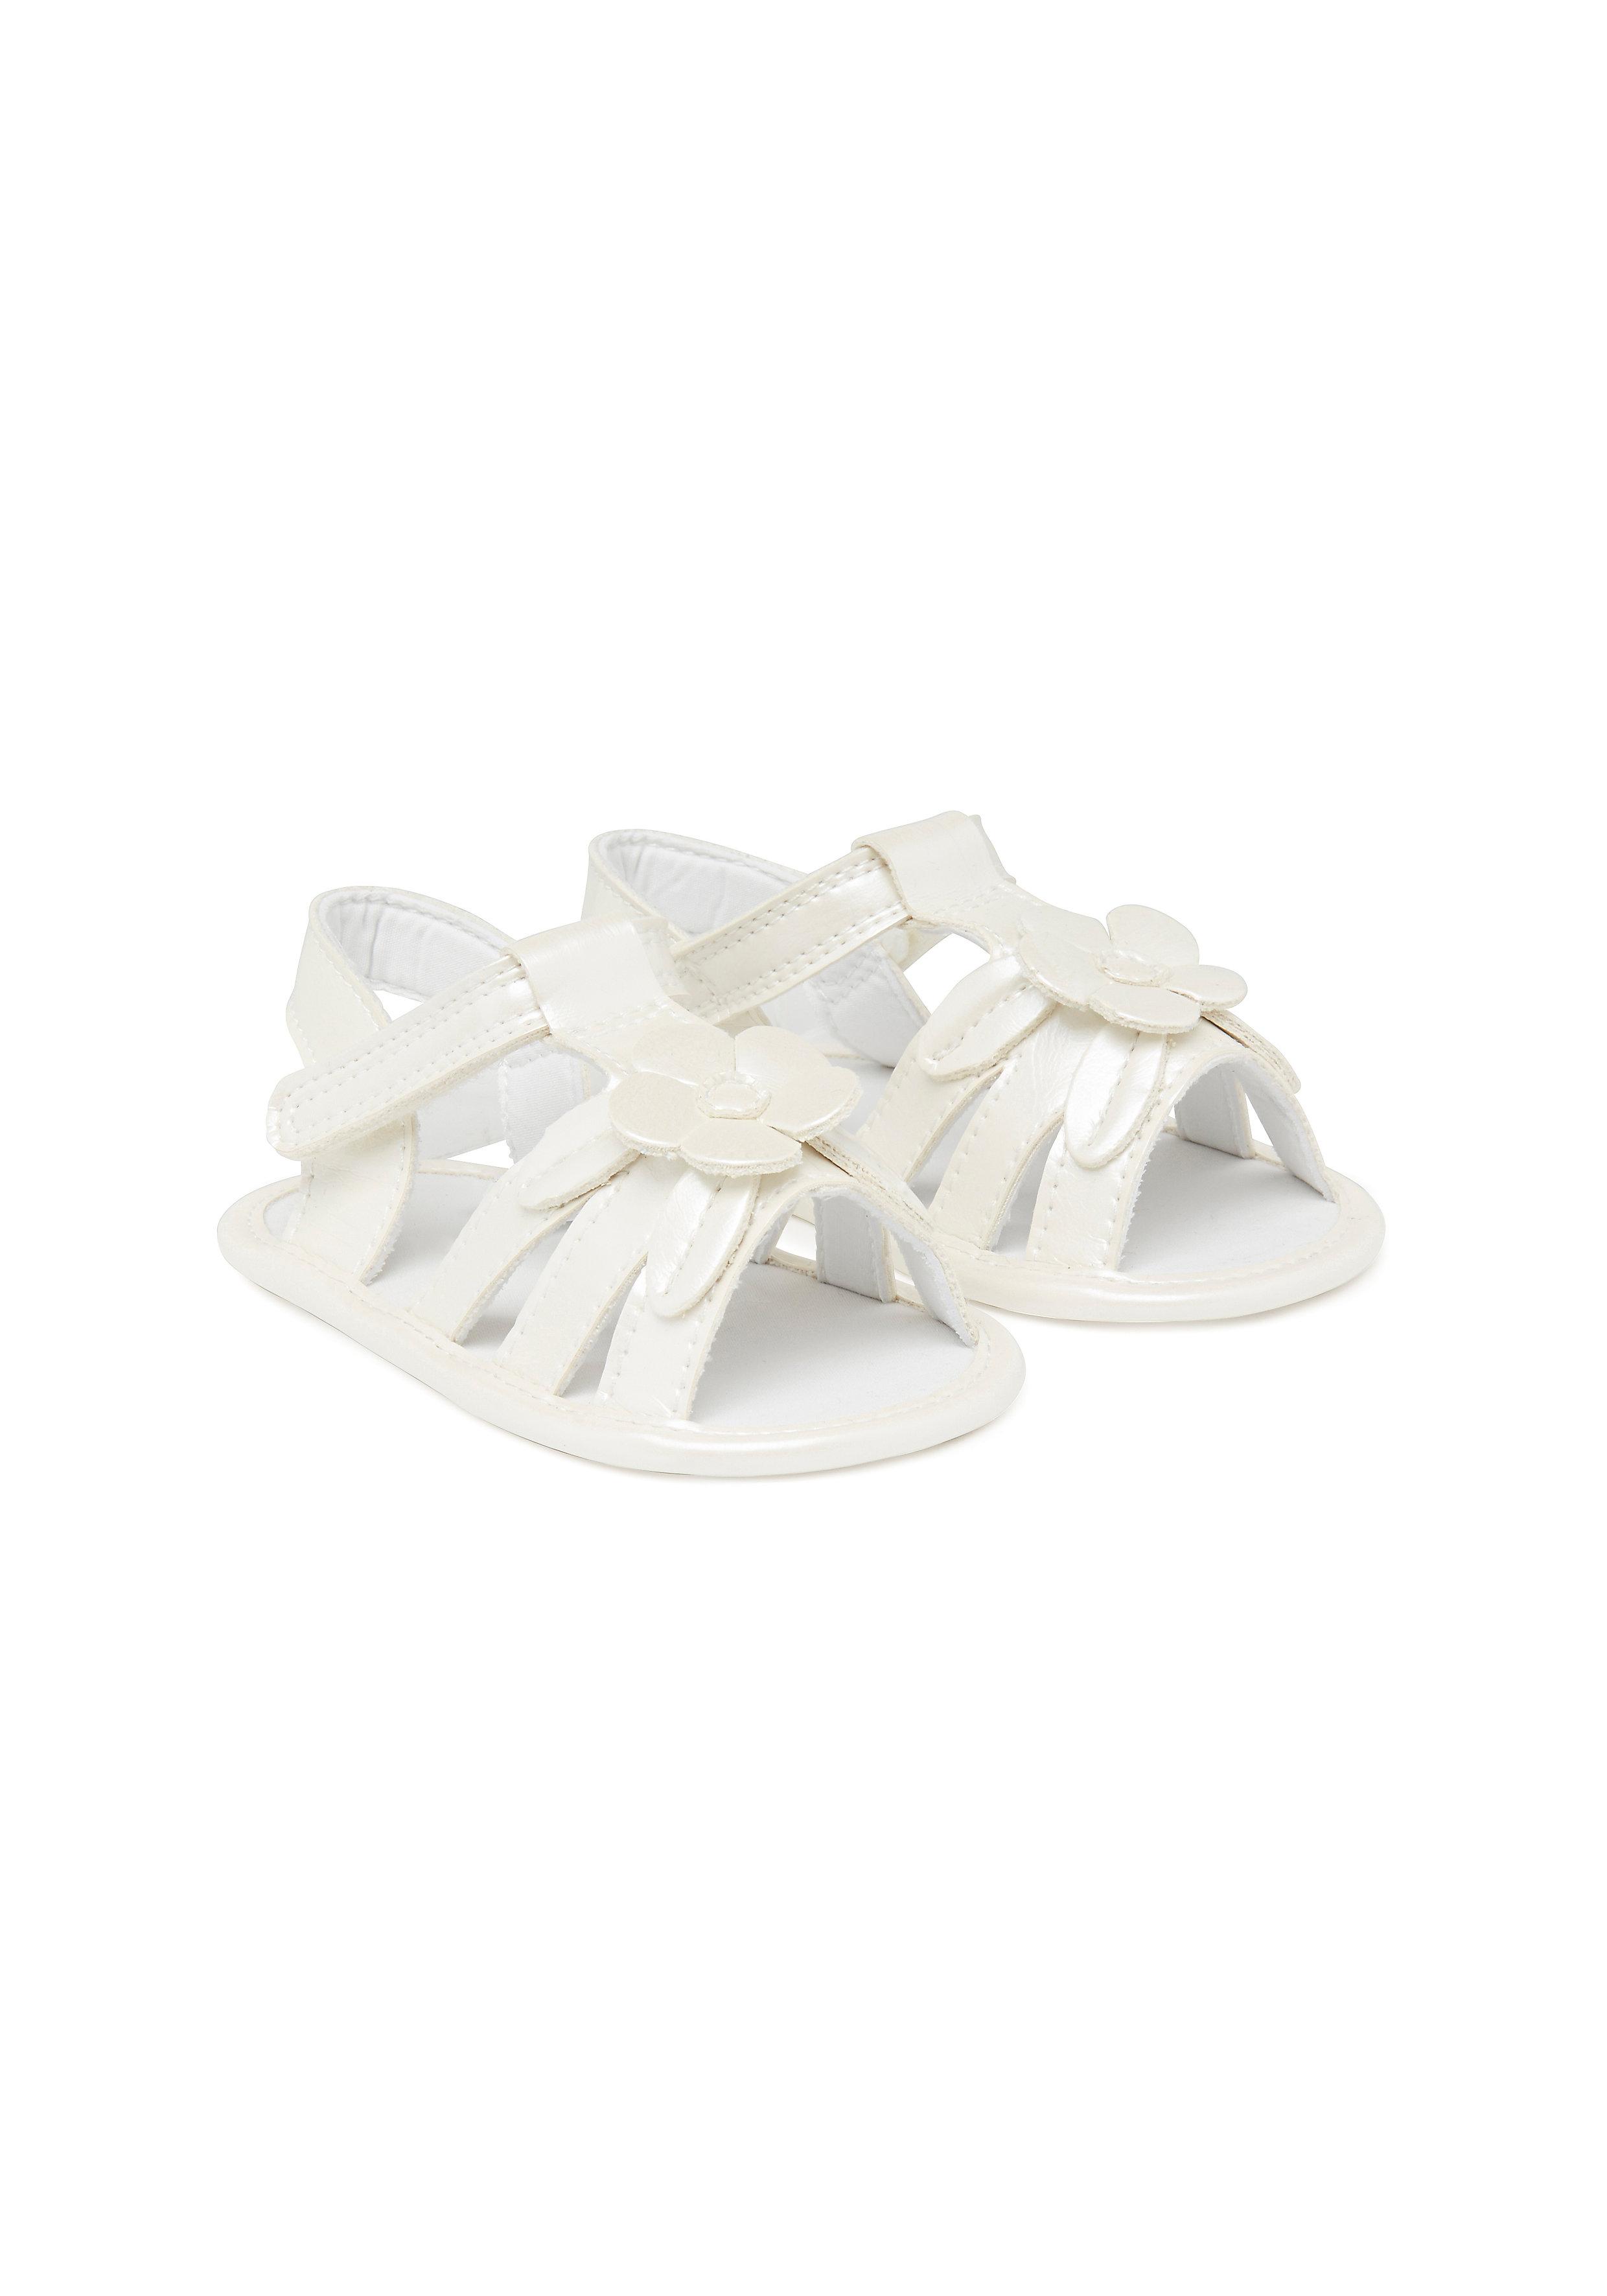 Mothercare | Girls Flower Sandals - Cream